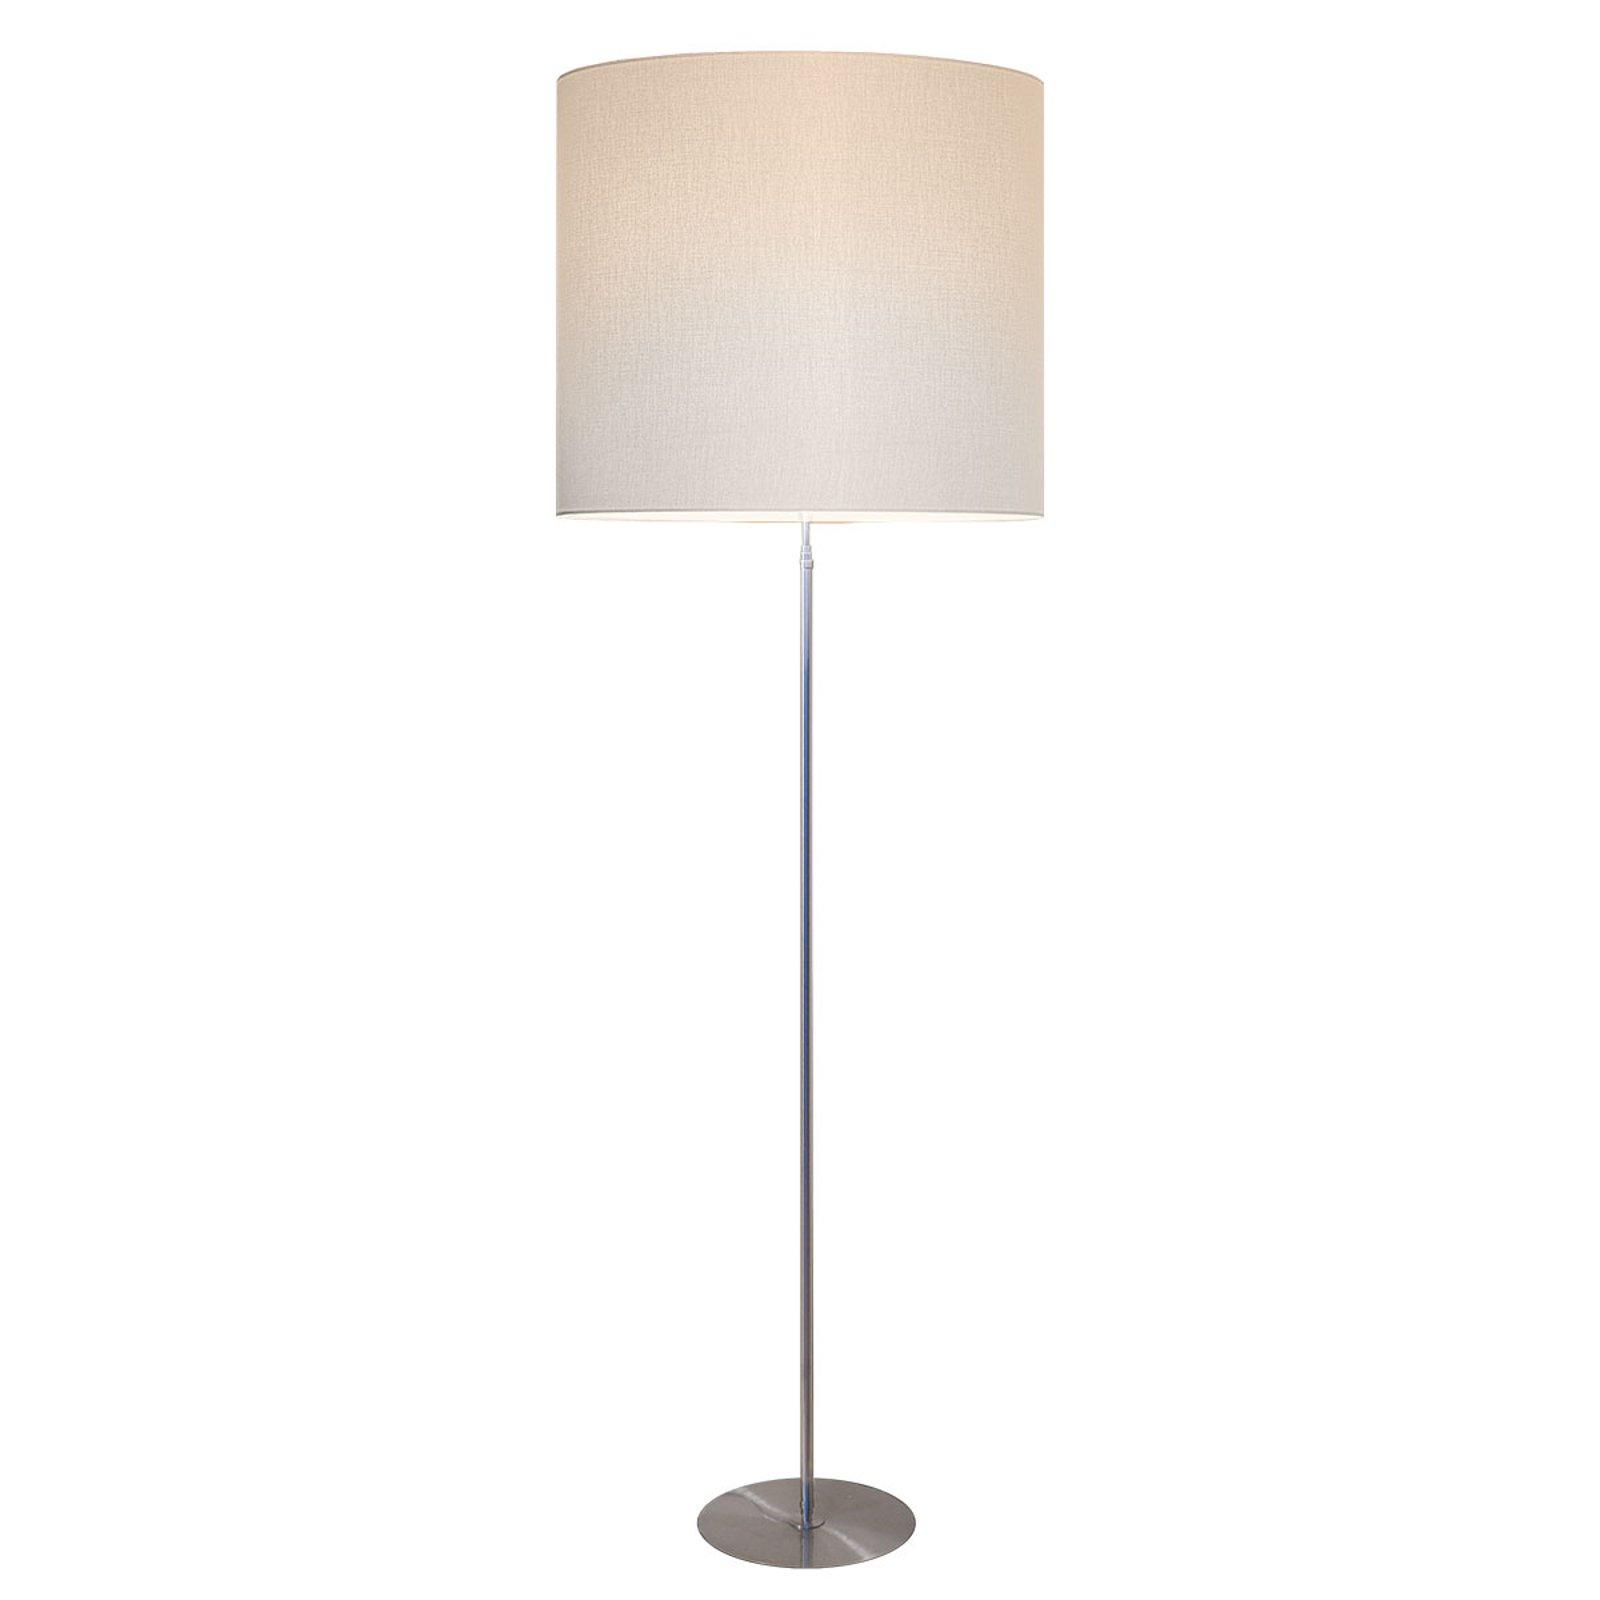 Moderne Tono gulvlampe i beige